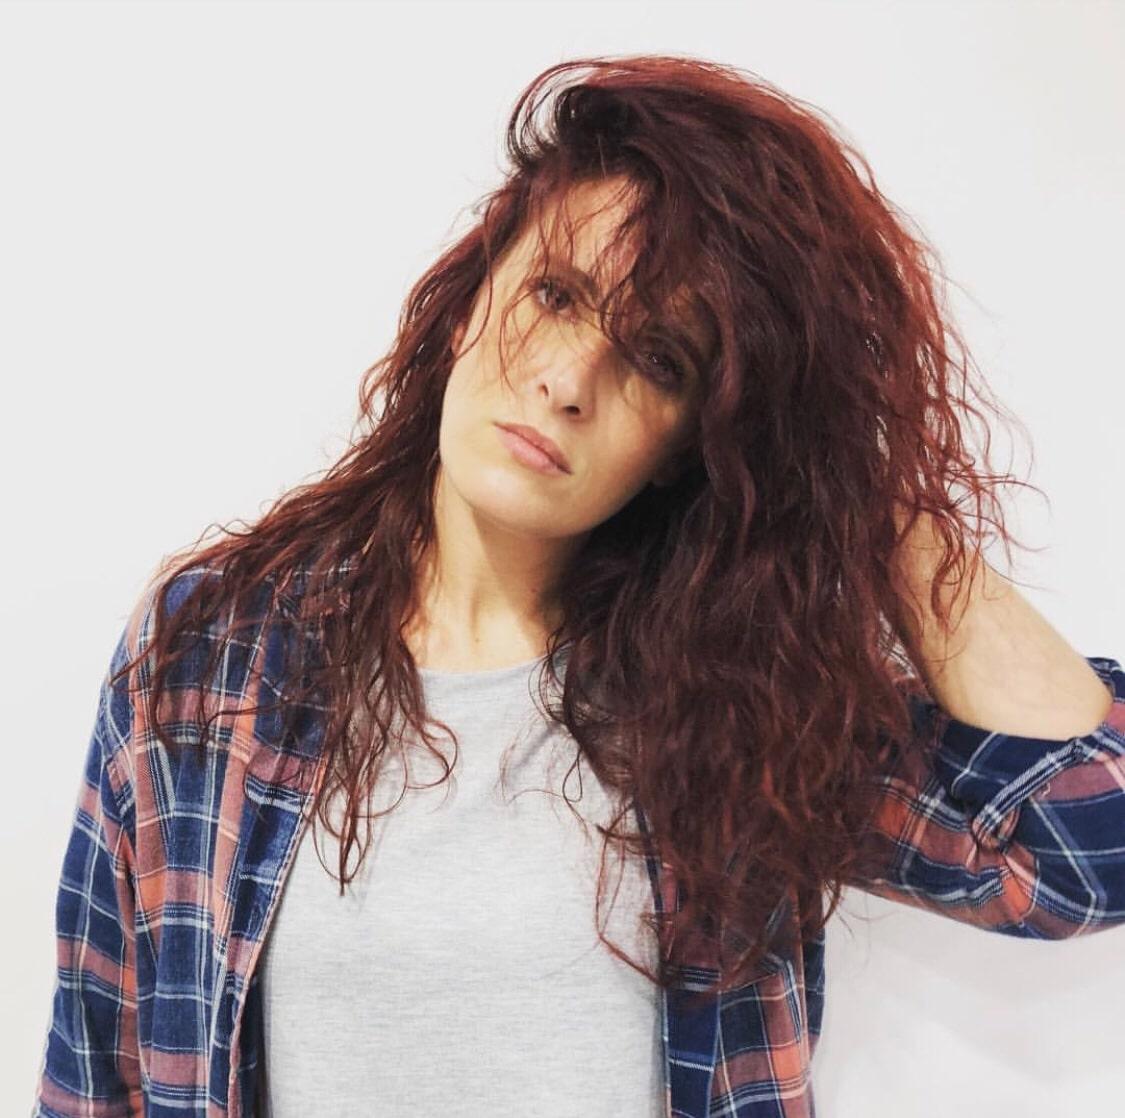 Hairdresser Melbourne Hair Salon Amp Stylist Brunswick East